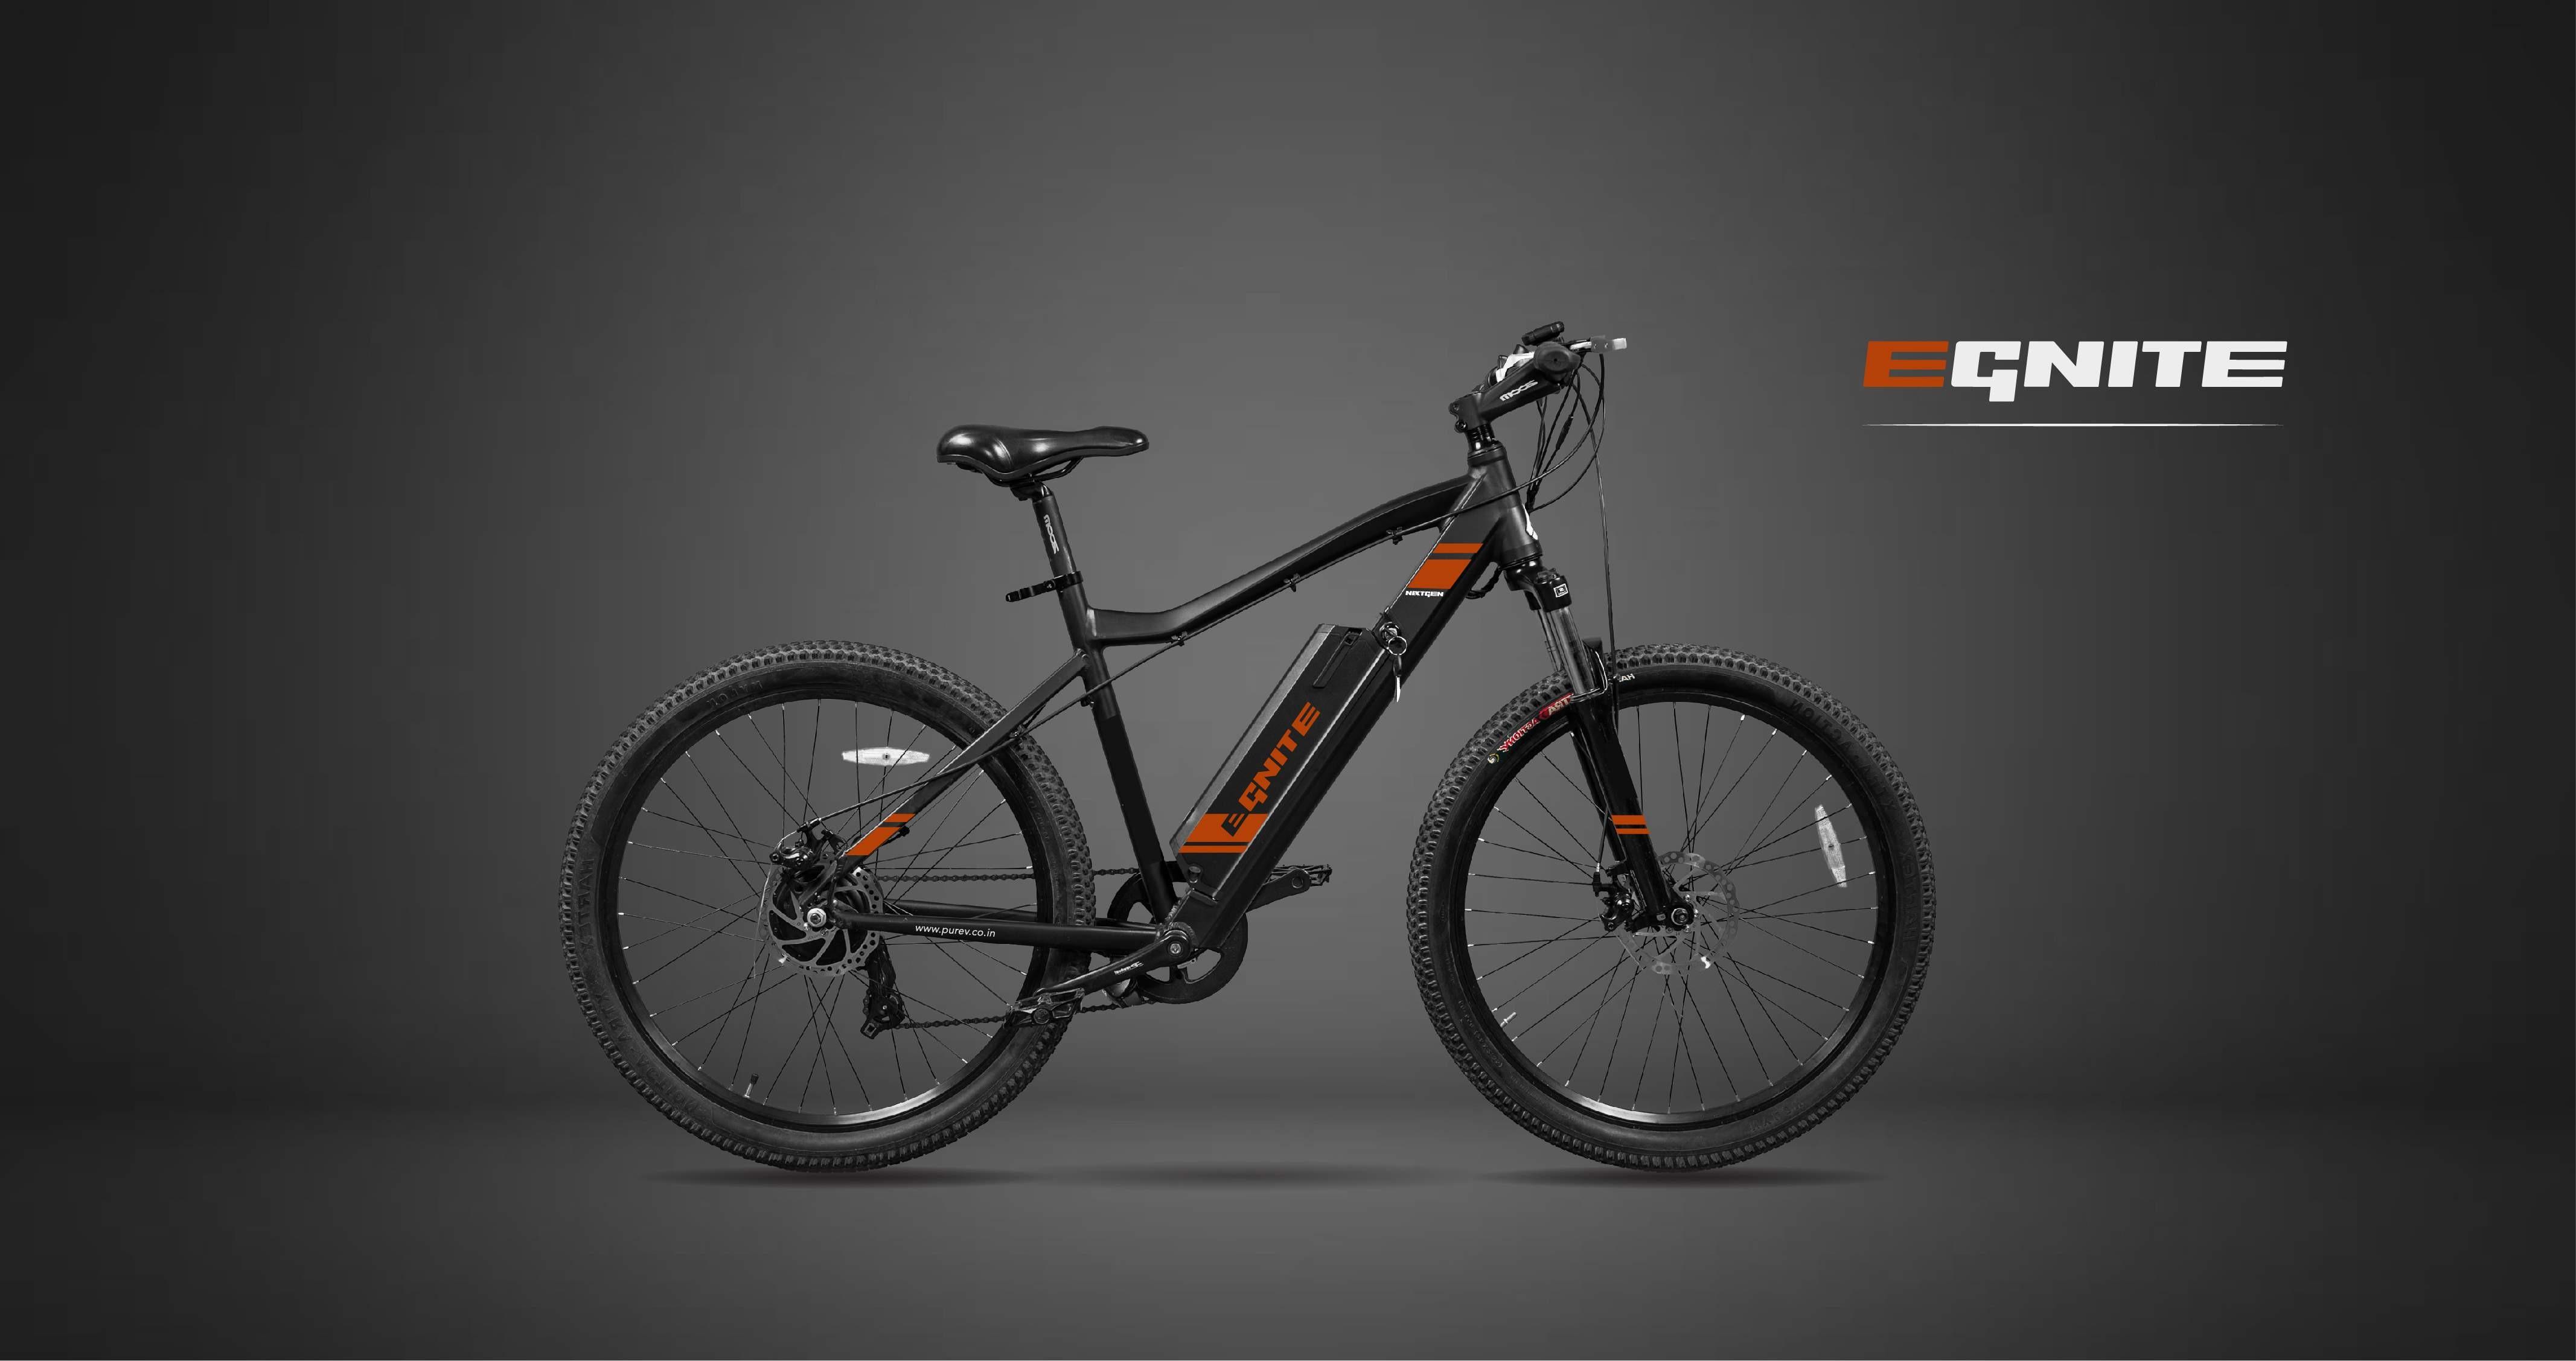 EGnite isIndia's longest range premium MTB bike